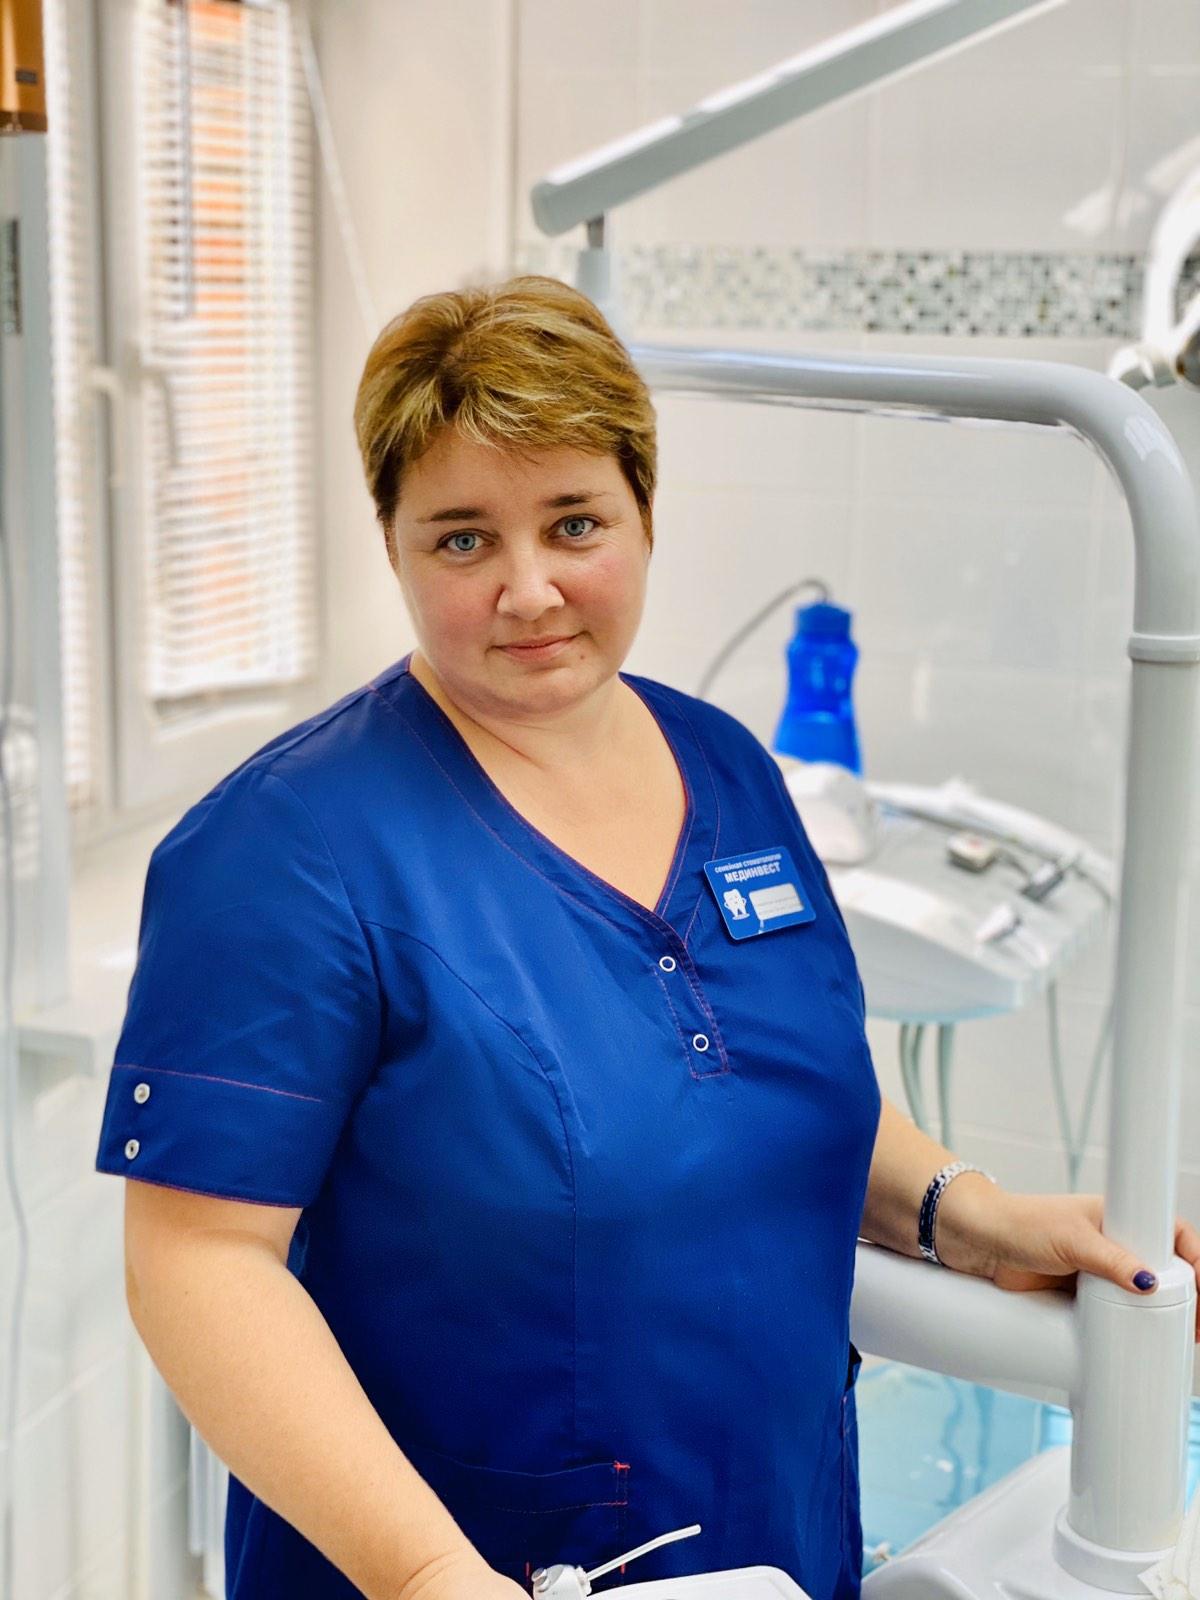 Концеренко Оксана Сергеевна - врач стоматолог пародонтолог